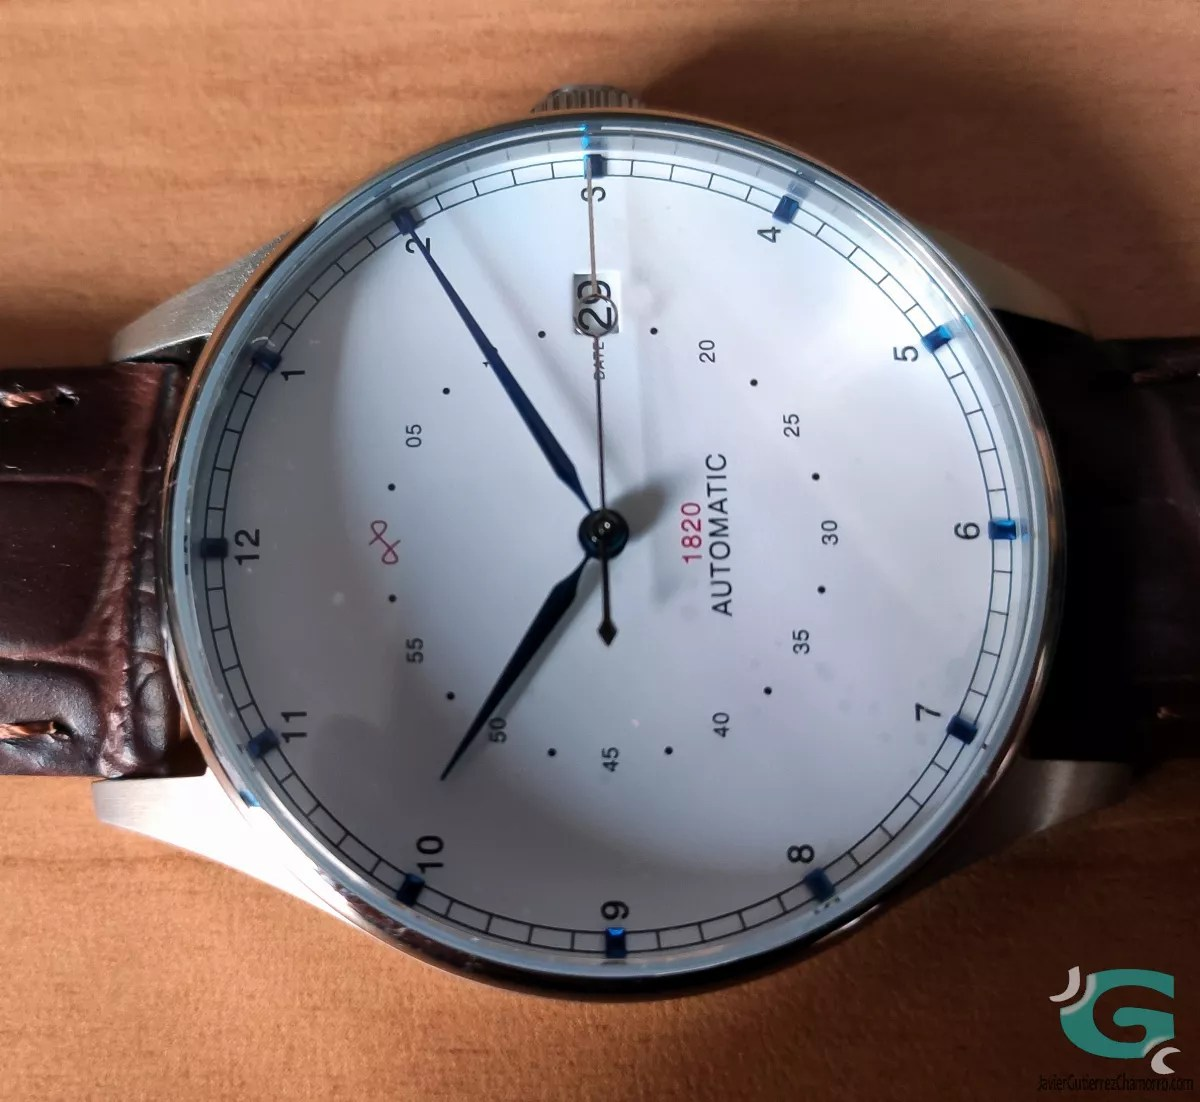 About Vintage 1820 Automatic